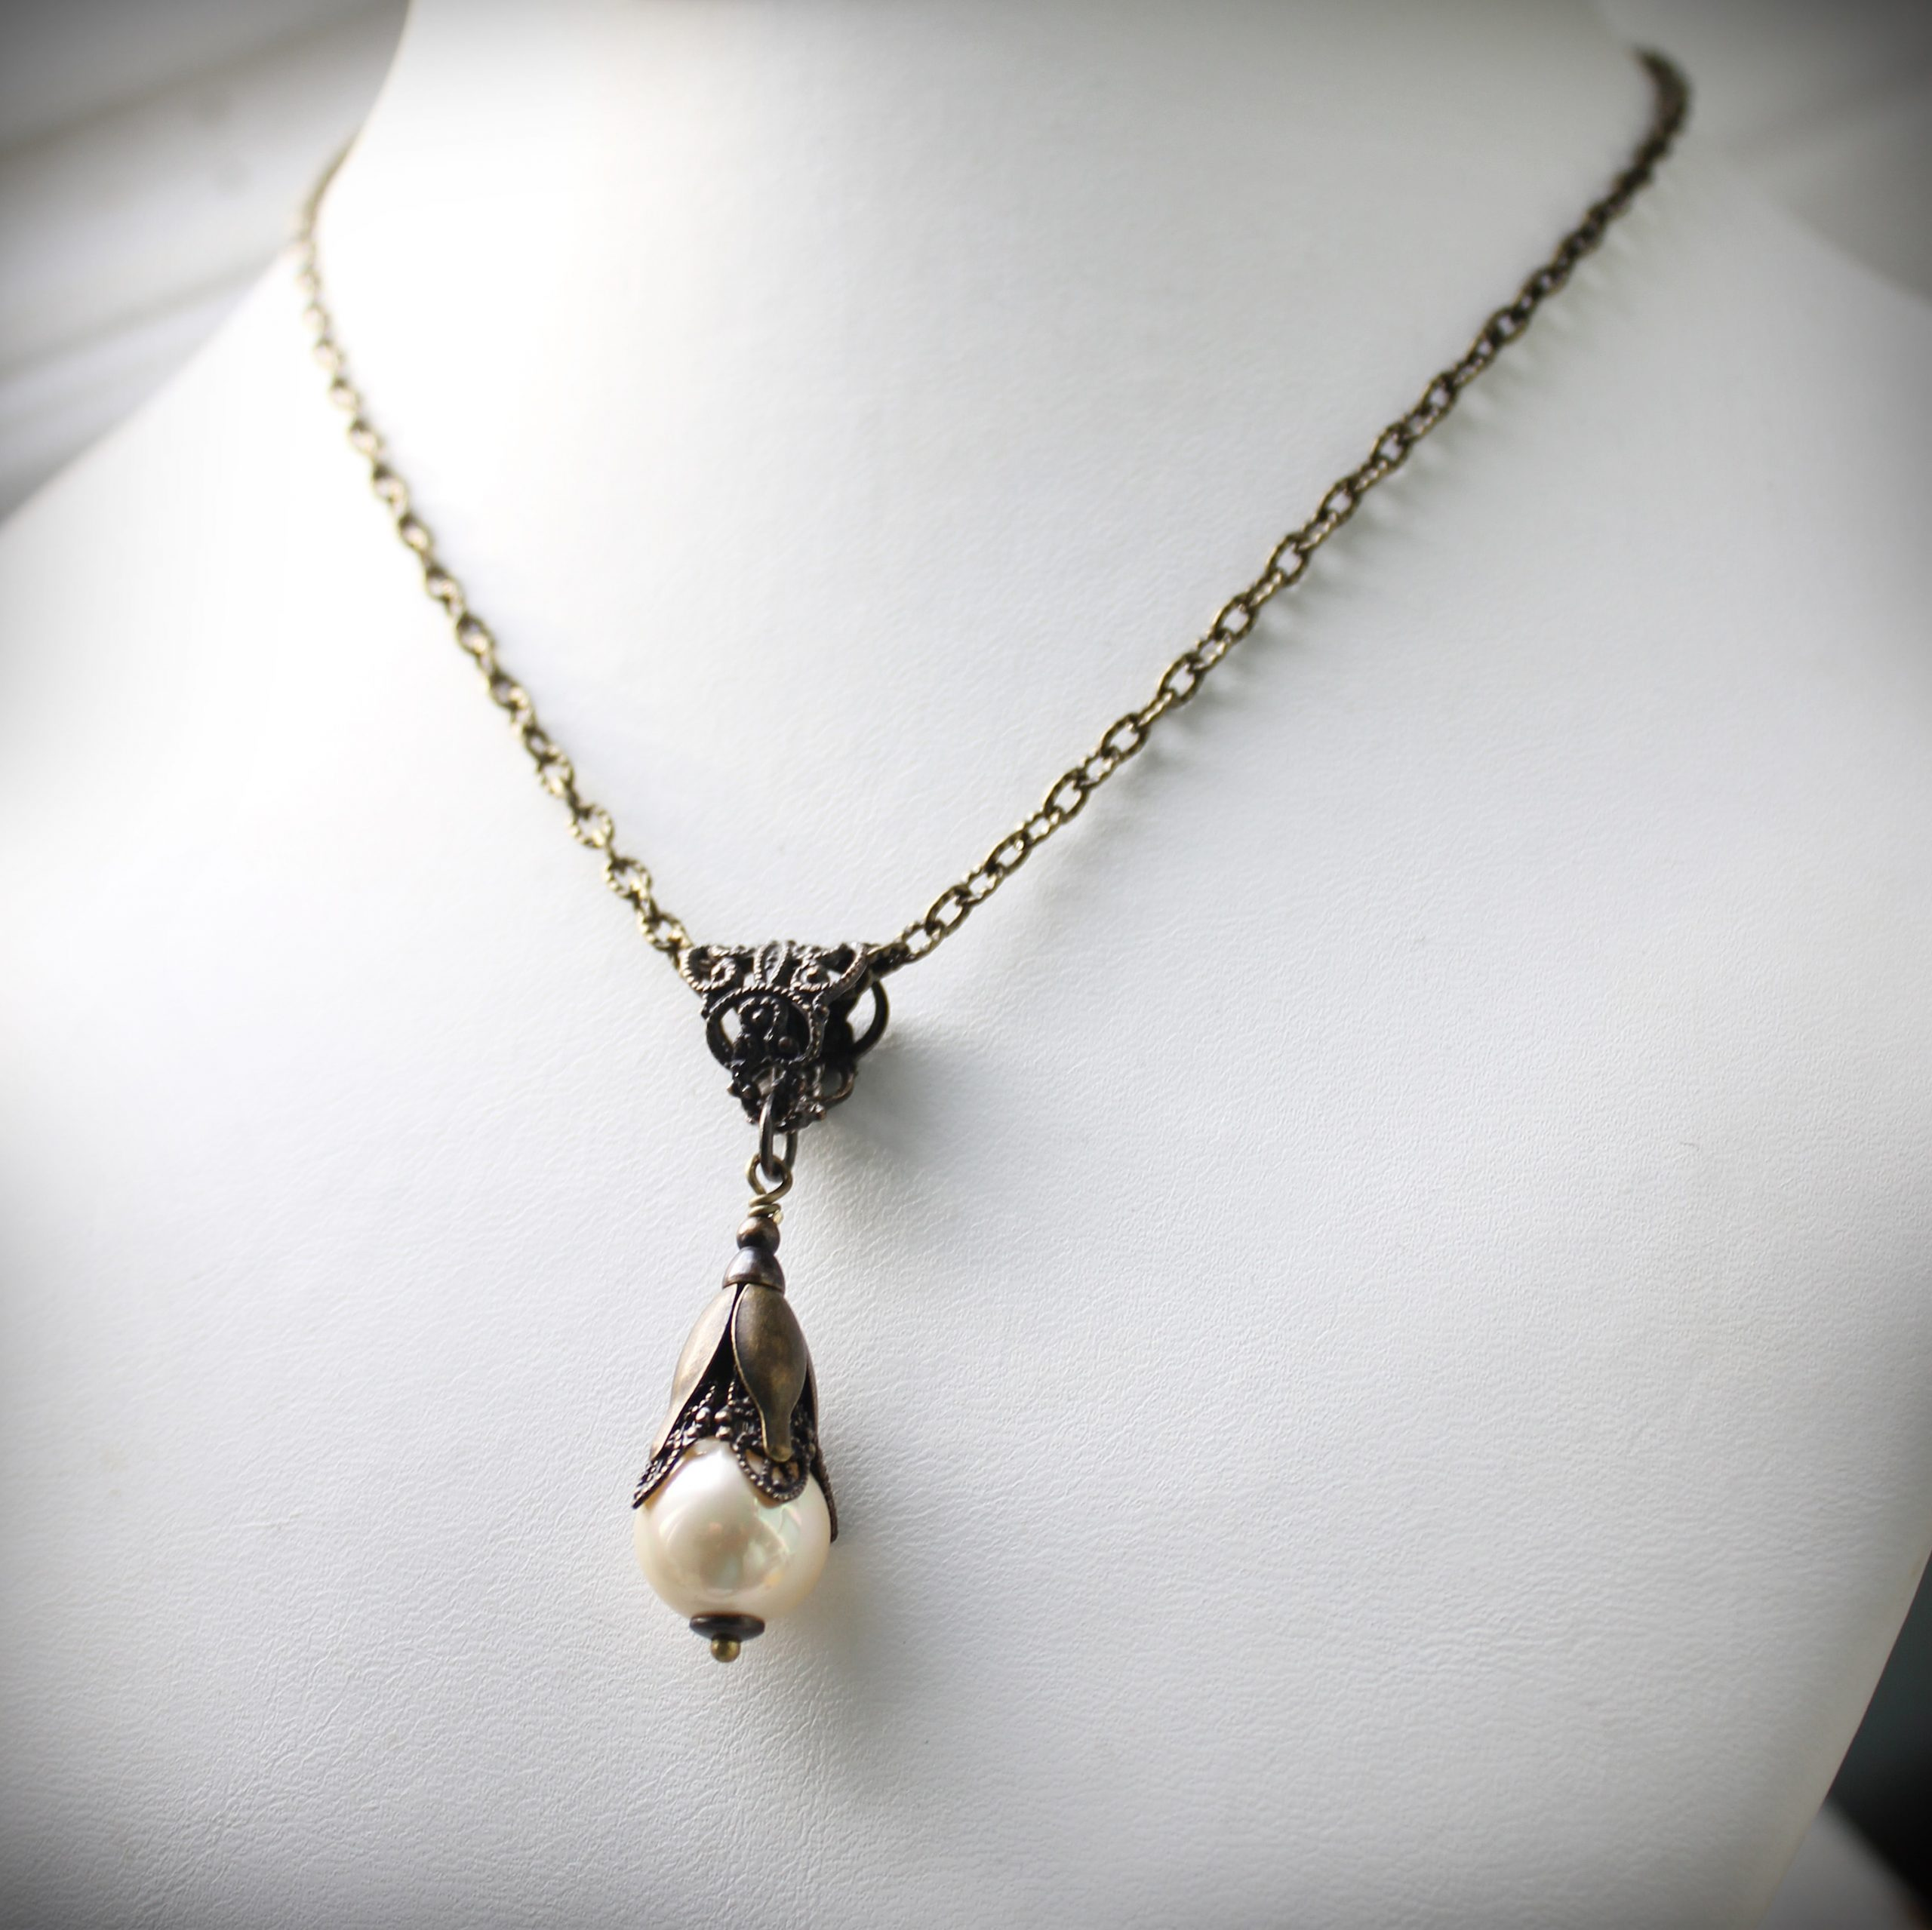 Creamy Pearl Vintage Style Pendant Necklace